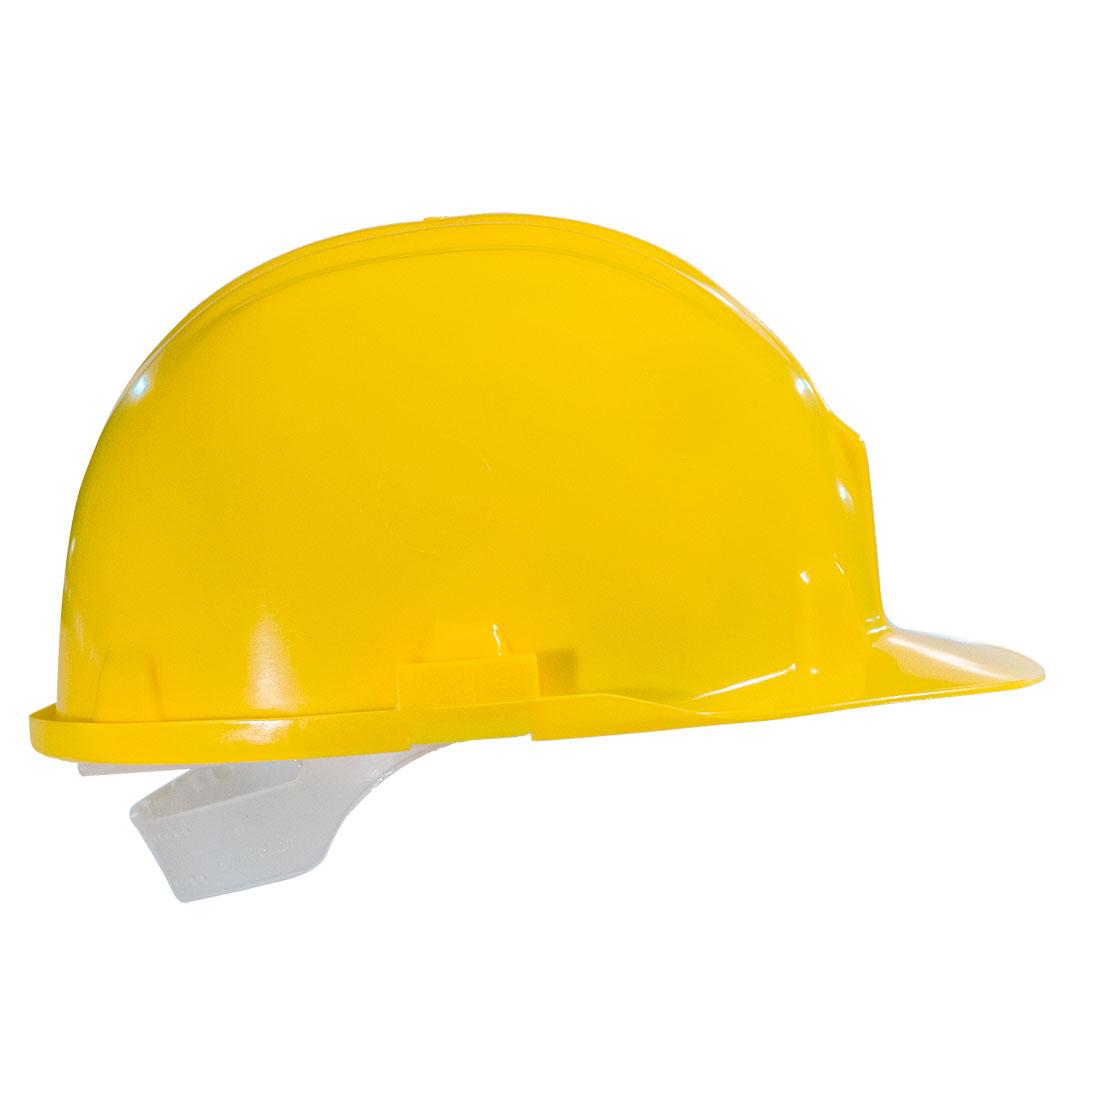 Workbase Safety Helmet